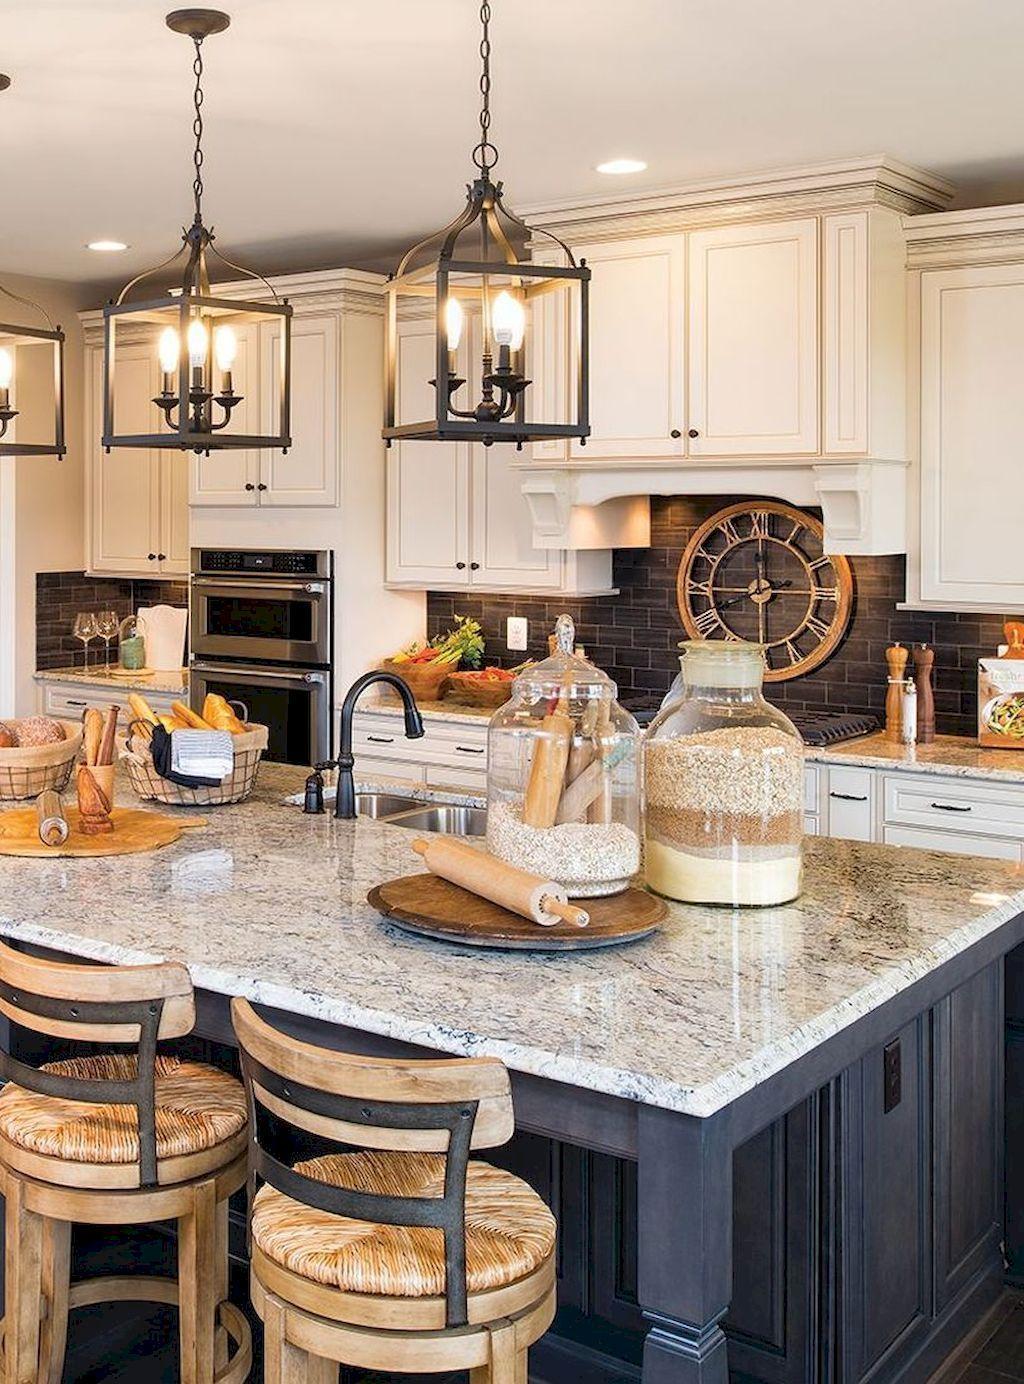 17 Beautiful Farmhouse Style Kitchen Ideas - Life, Love, & Shiplap